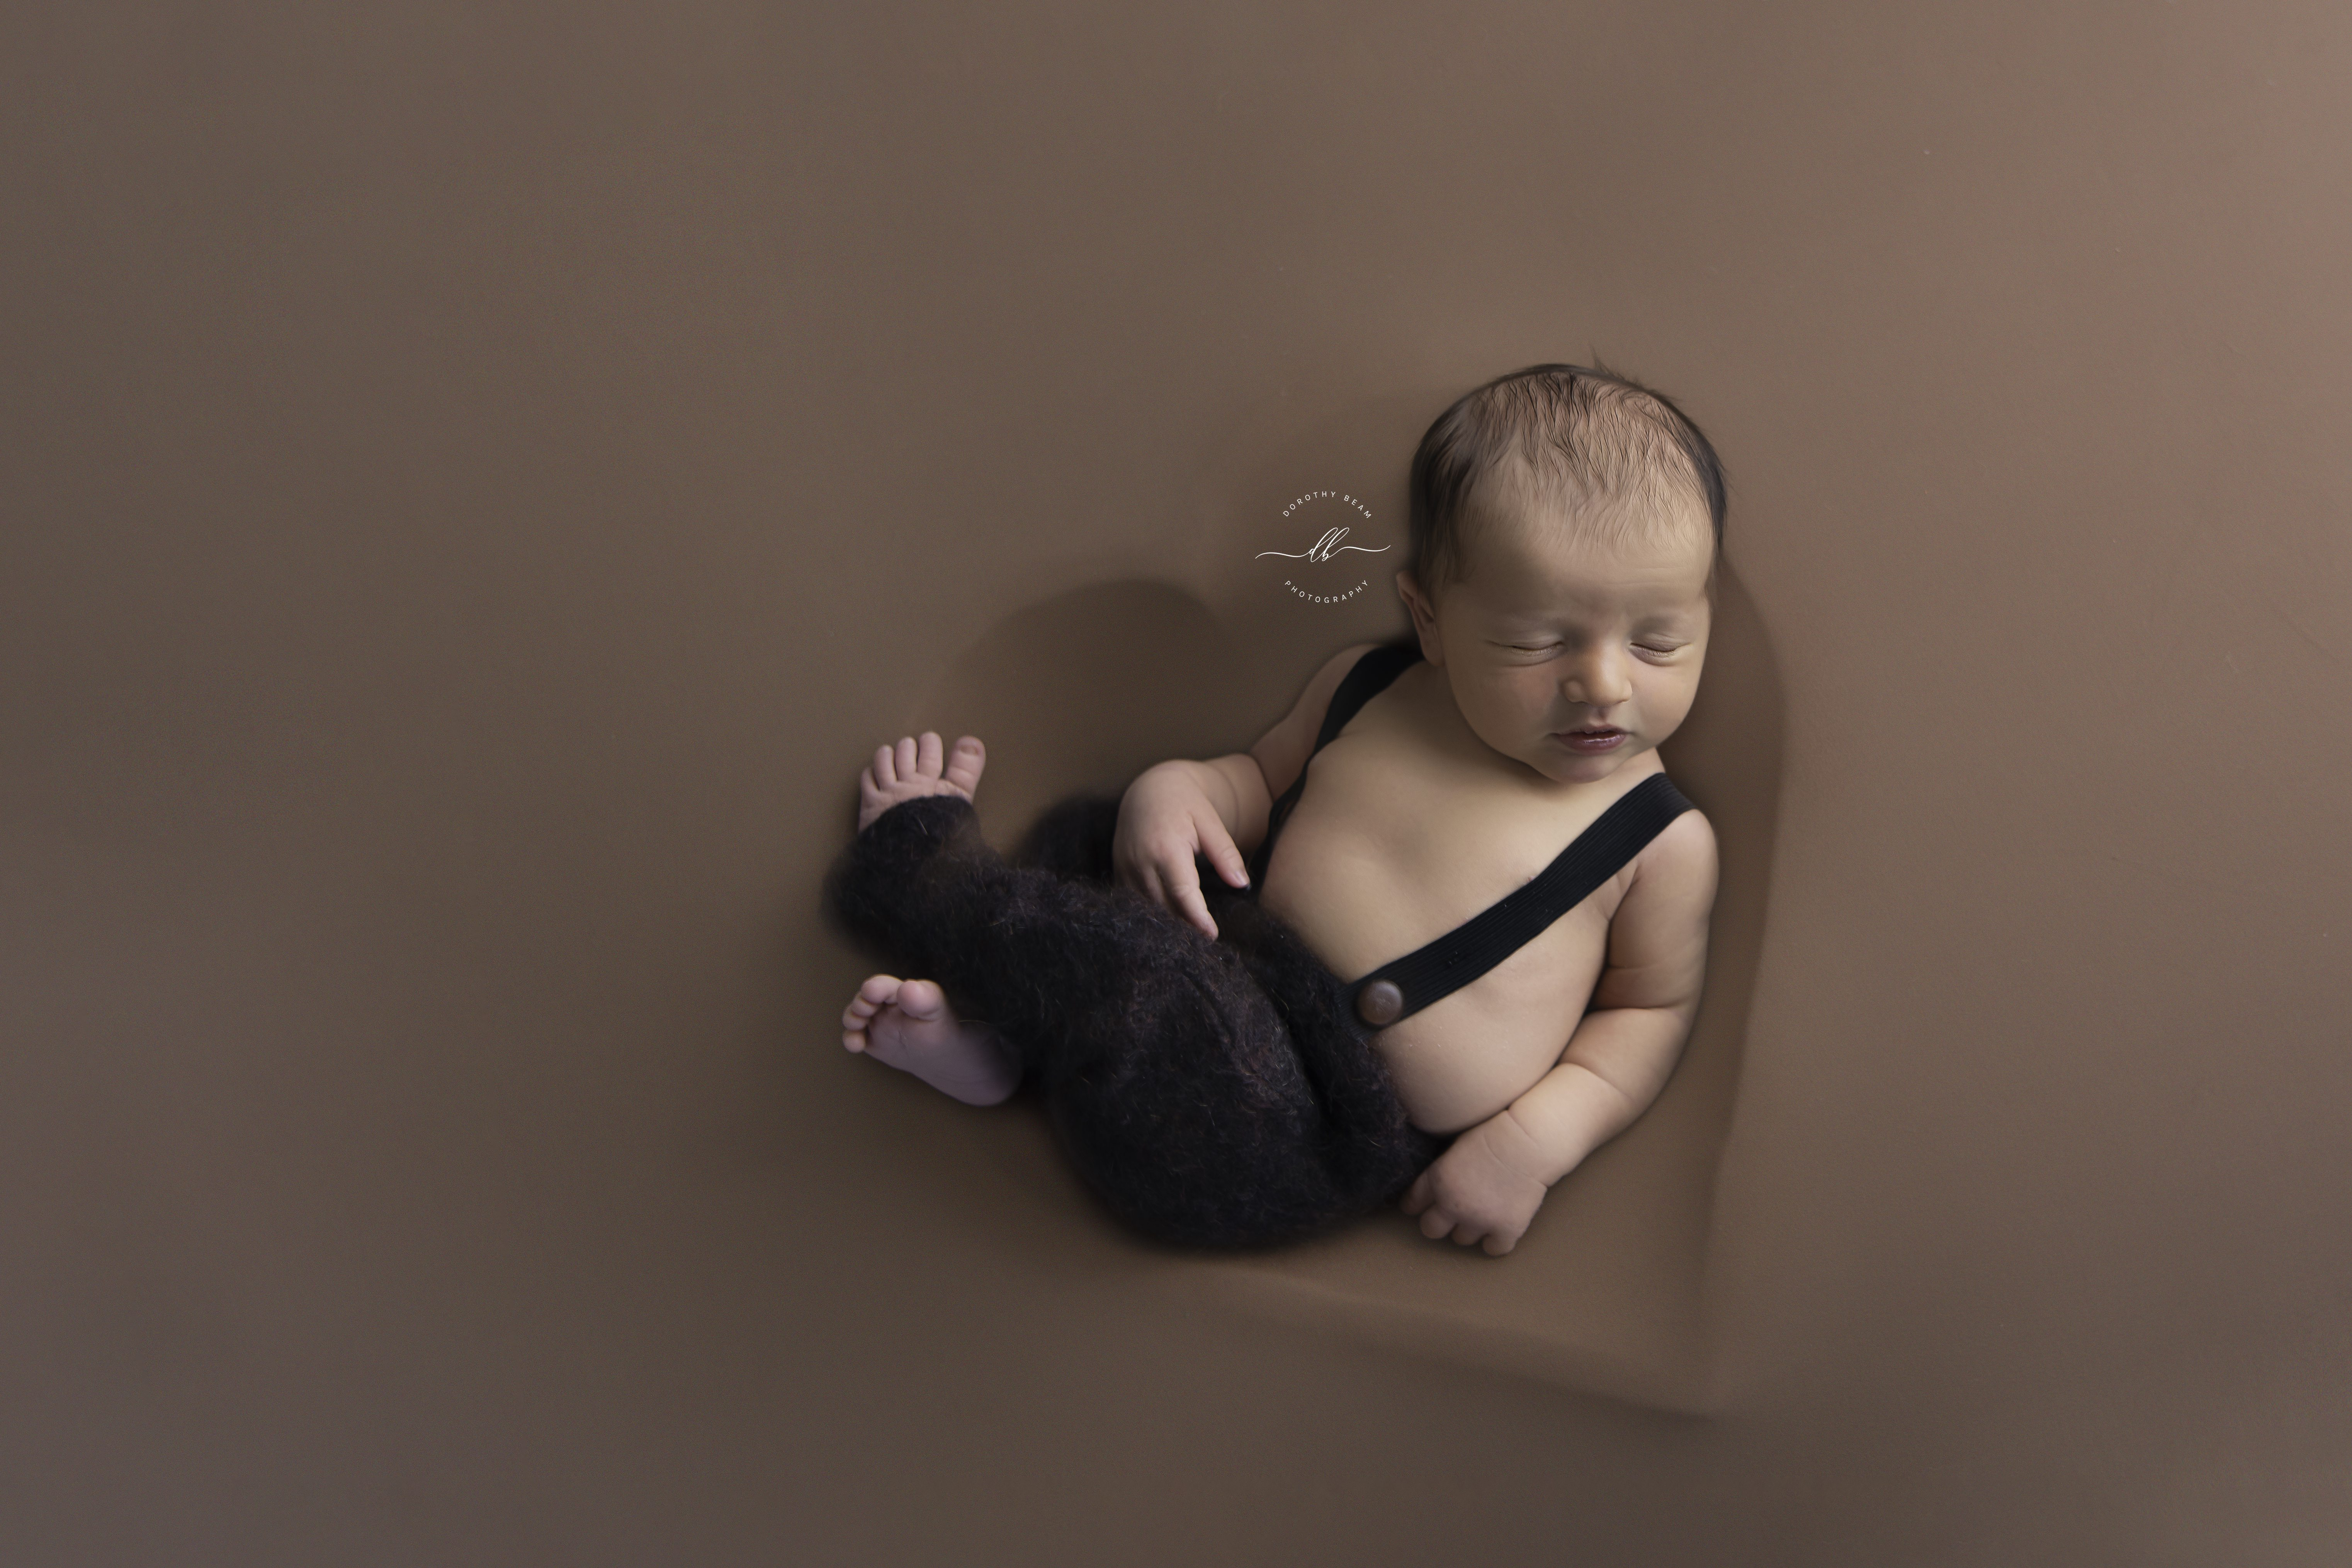 Boy Heart Bowl Brown Overalls Newborn